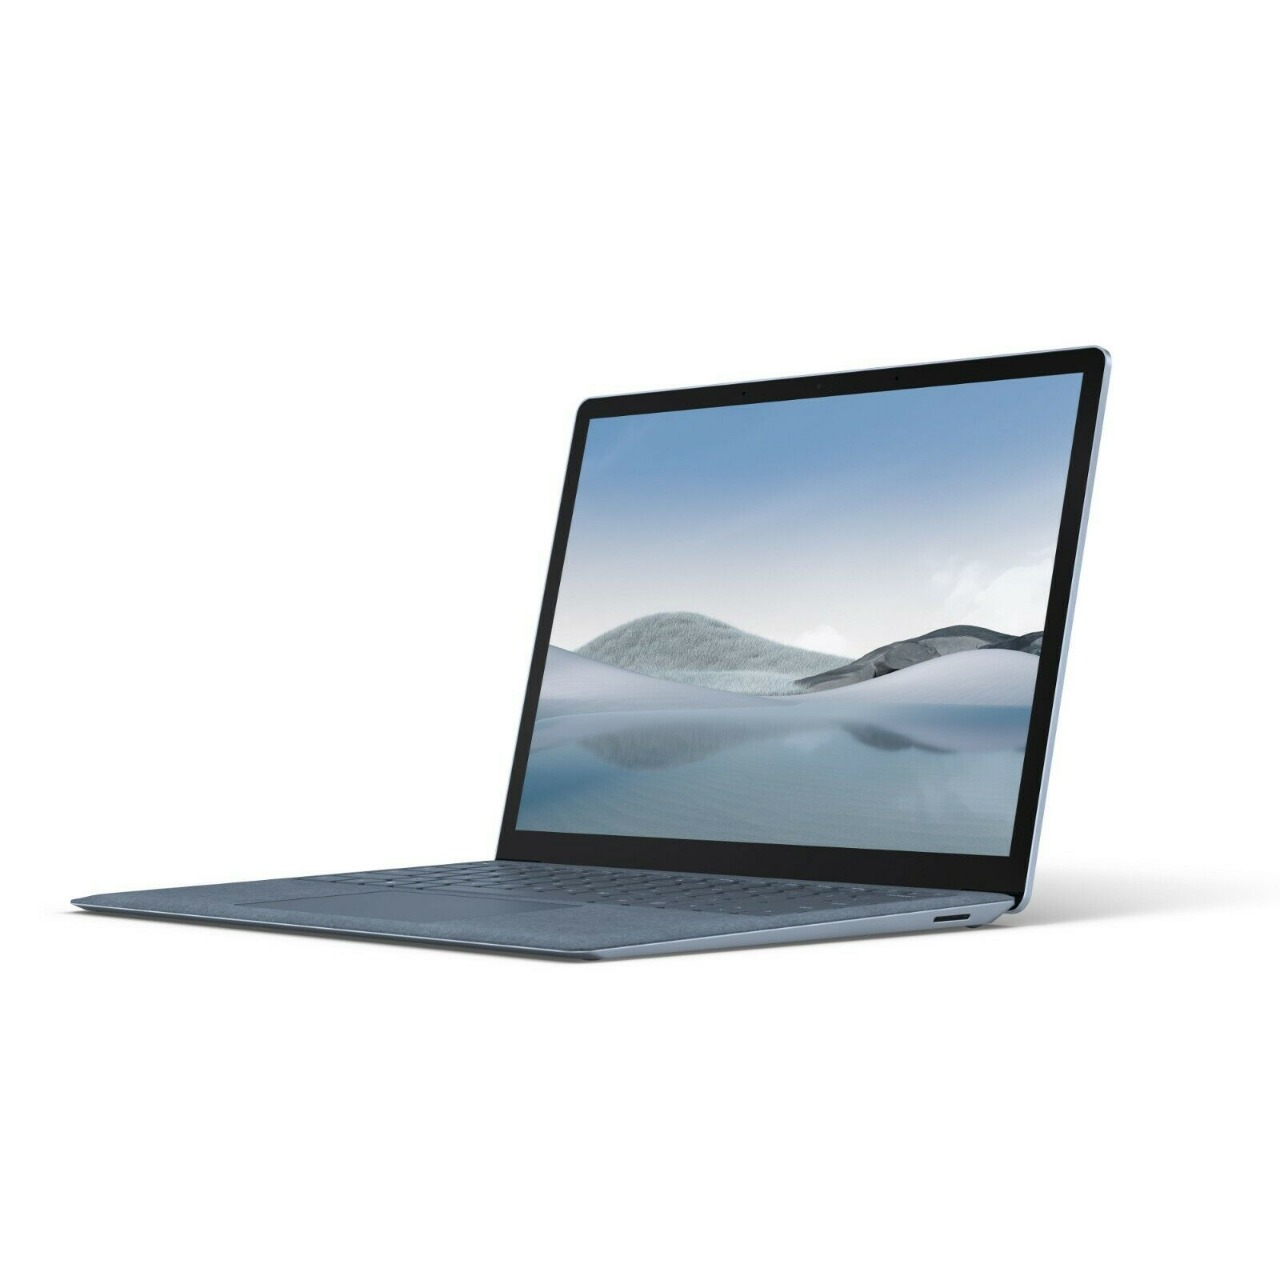 Microsoft Surface laptop 4 core i5 8gb 512gb Ice Blue